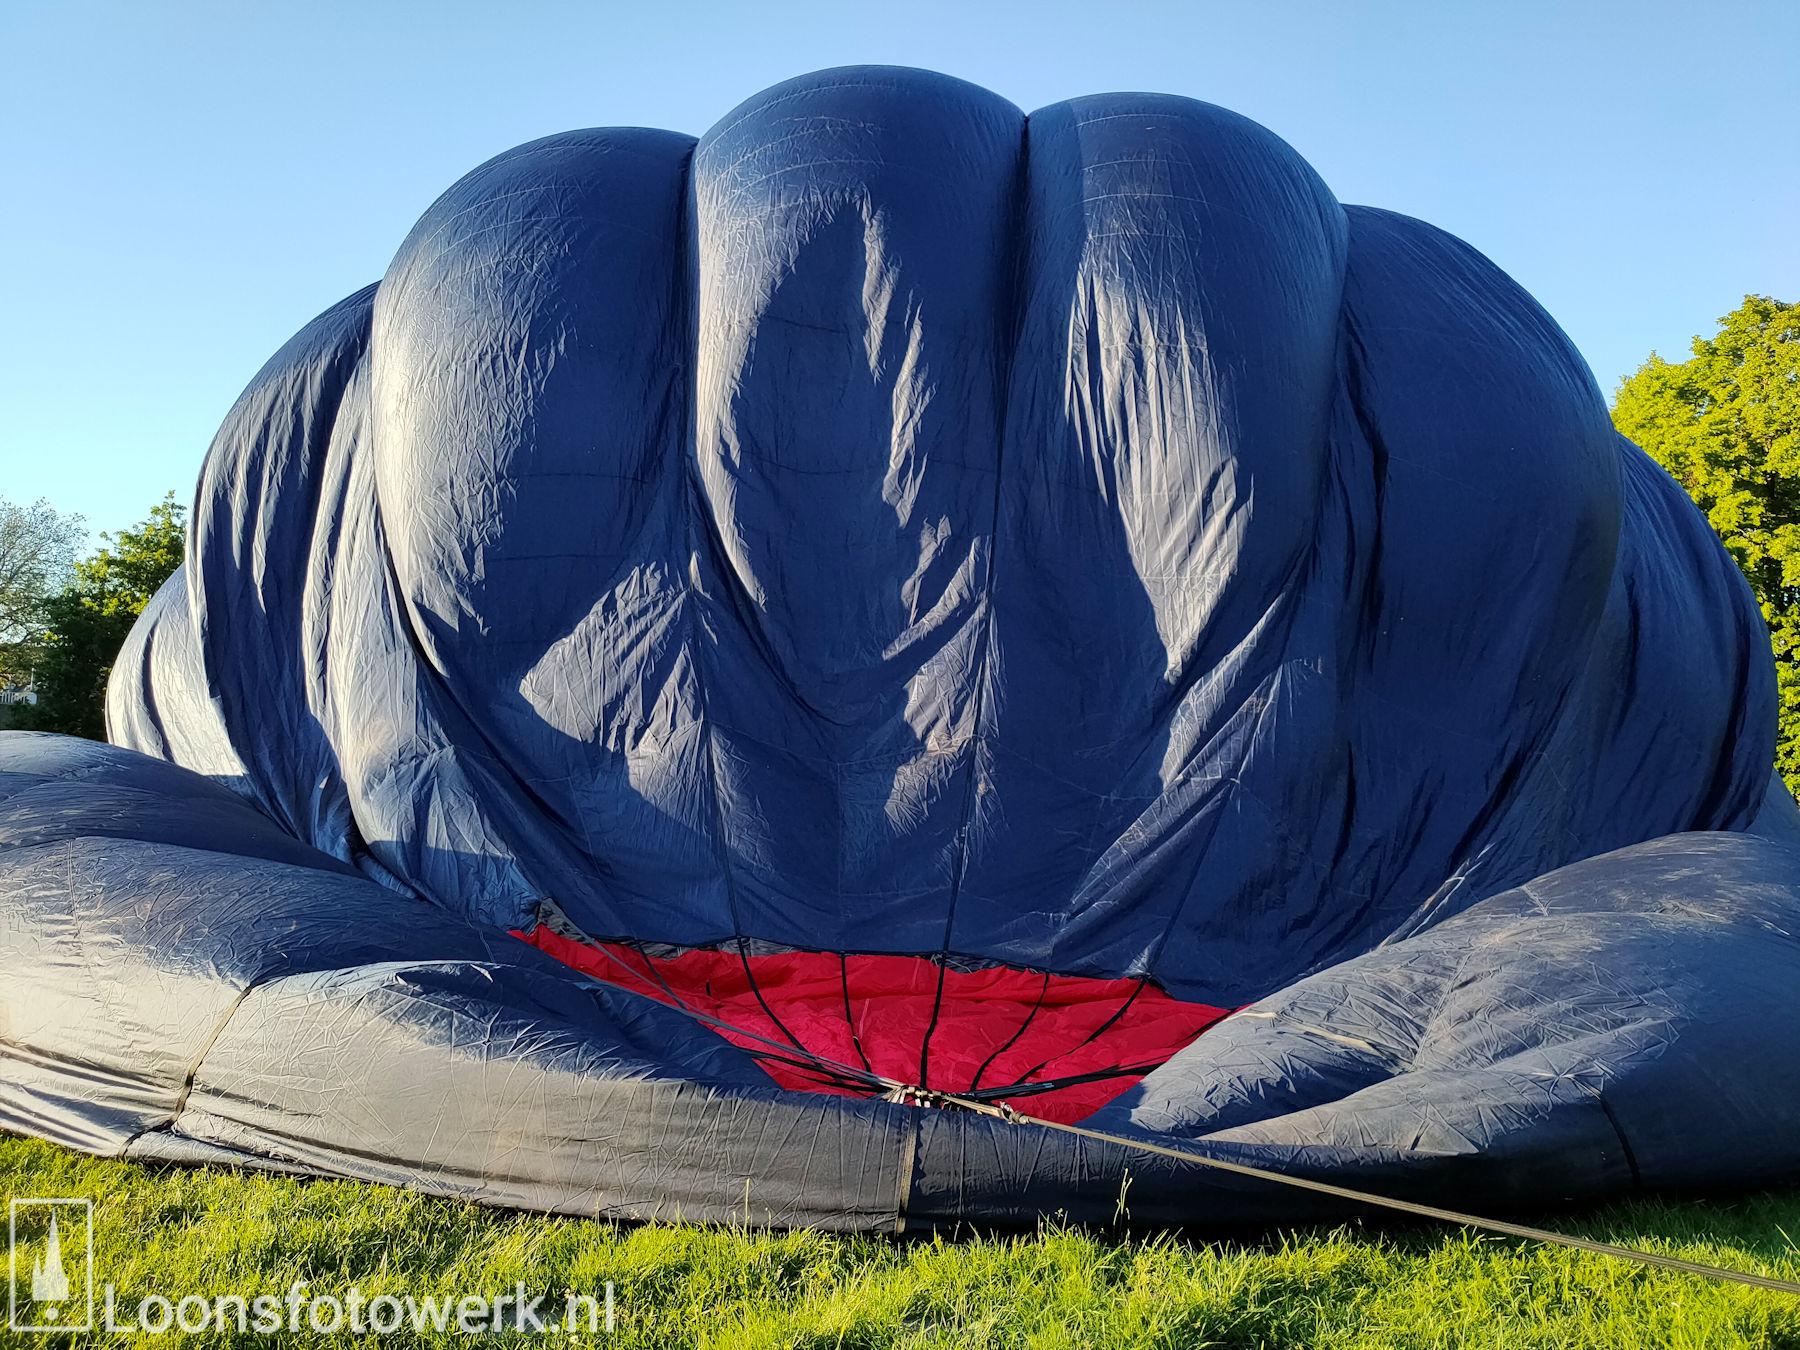 Ballonvaart vanaf de Kasteelweide 8